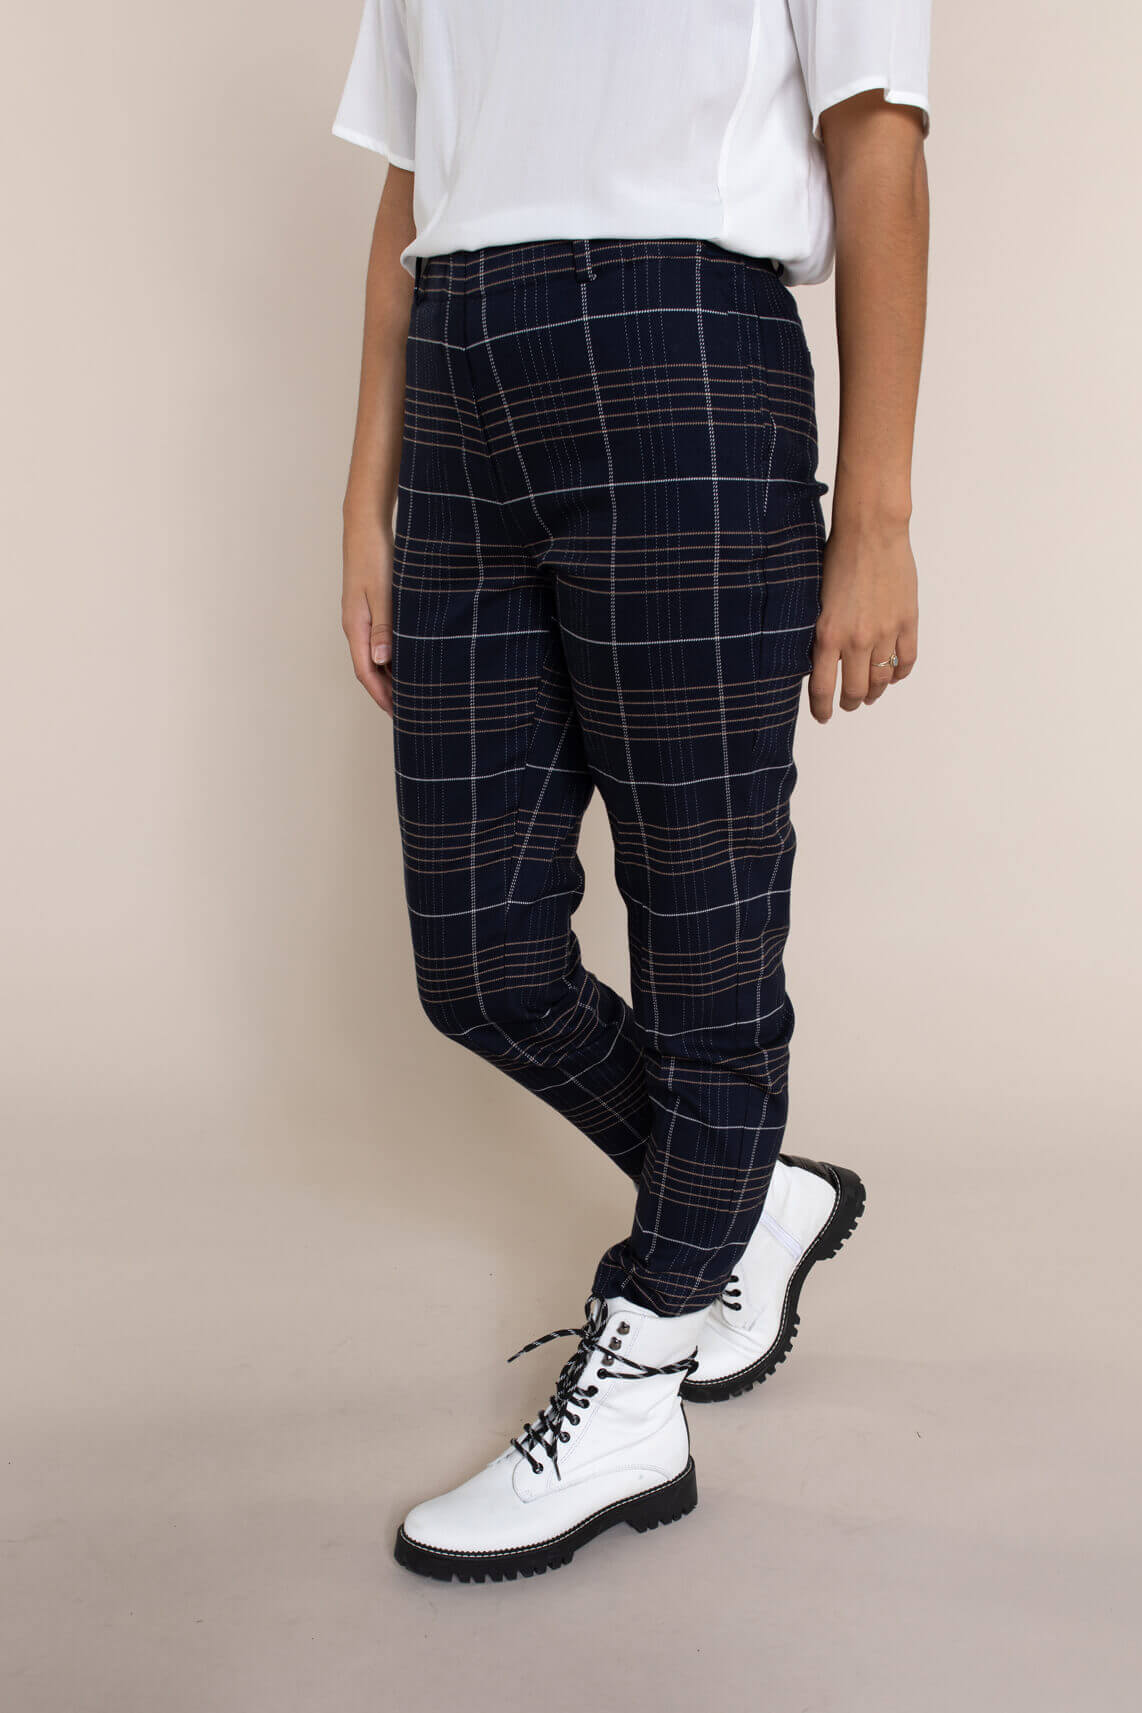 Marc O'Polo Dames Geruite pantalon Blauw